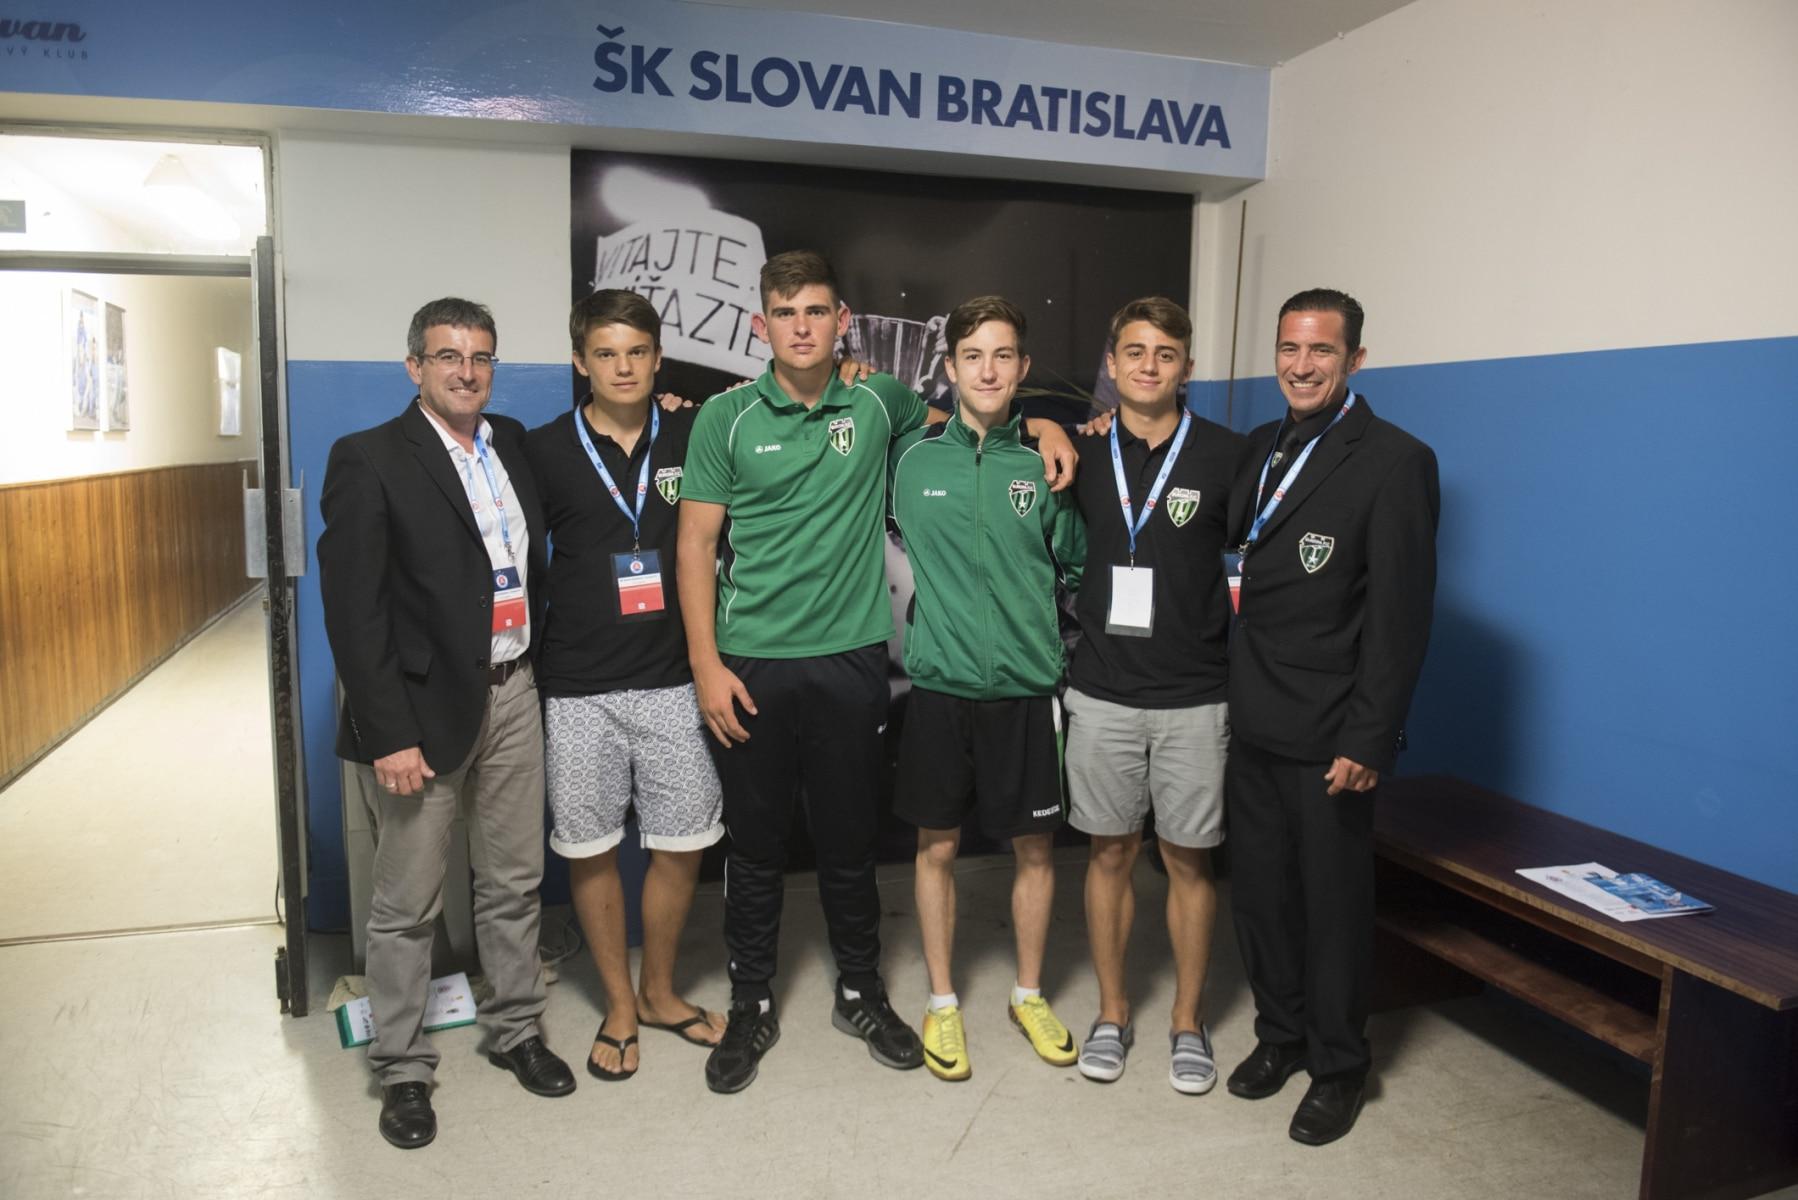 sk-slovan-bratislava-europa-fc-gibraltar-09072015-13_19570567125_o